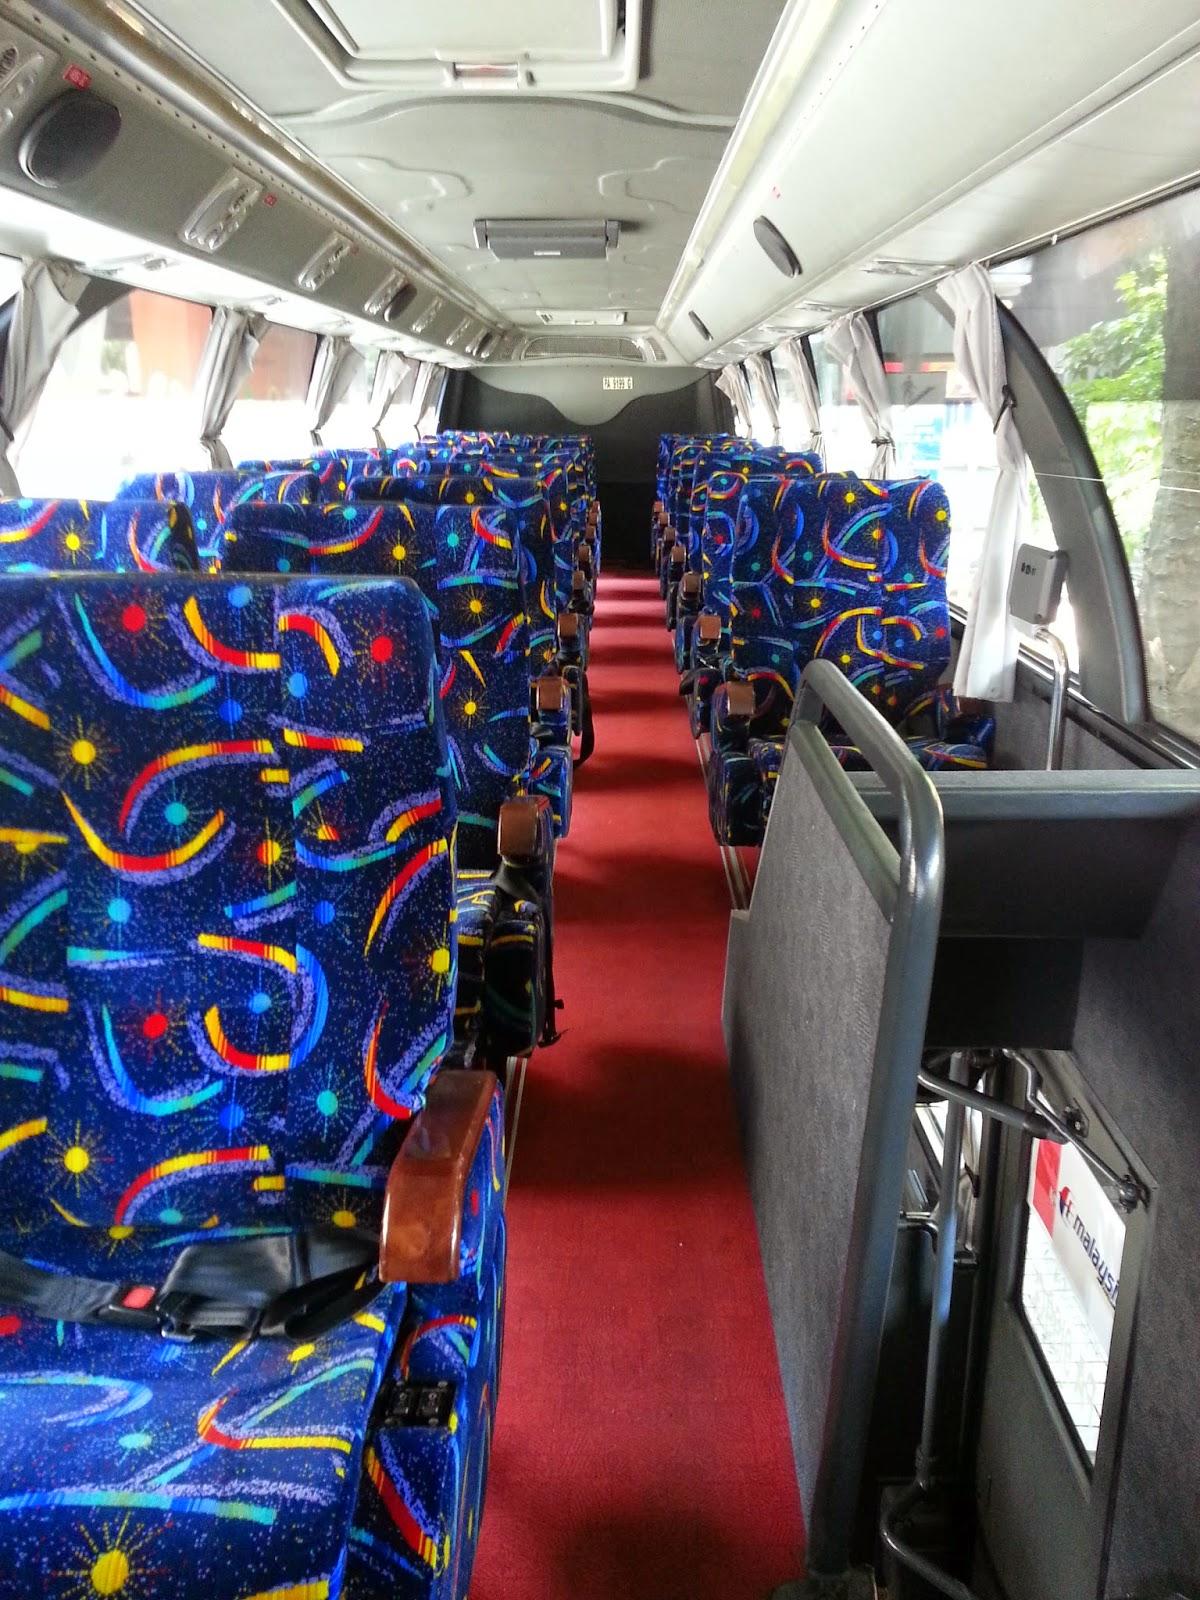 WTS Bus Tavel Company Review (Singapore-KL) - Joysofyz ...